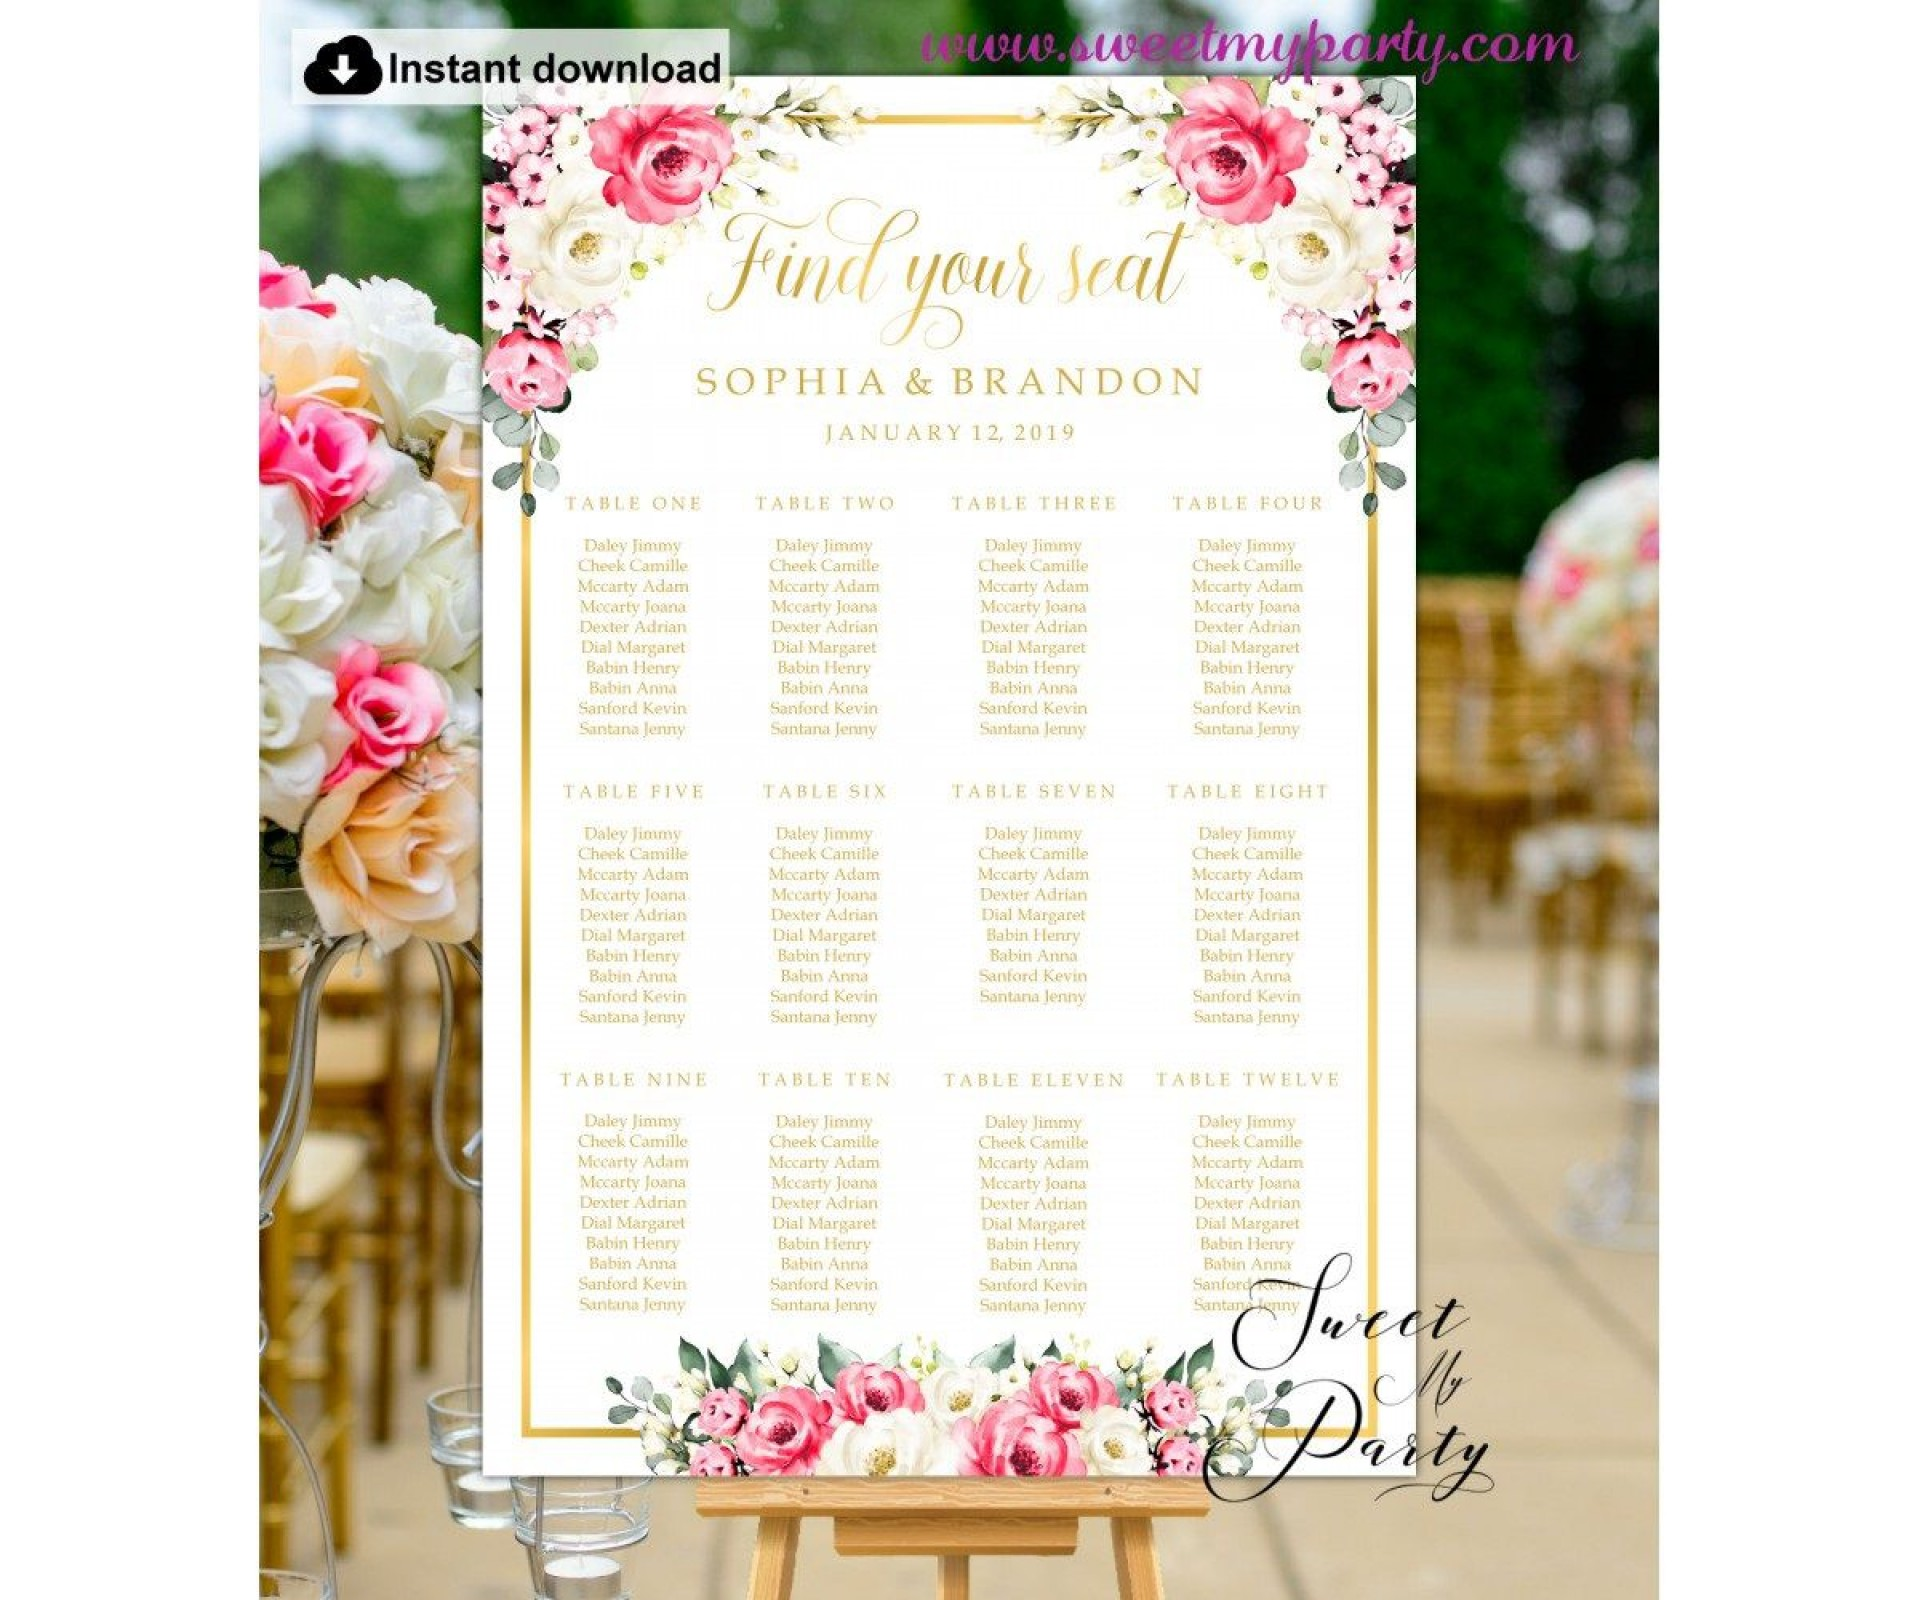 009 Wondrou Wedding Seating Chart Template Sample  Templates Plan Excel Word Microsoft1920